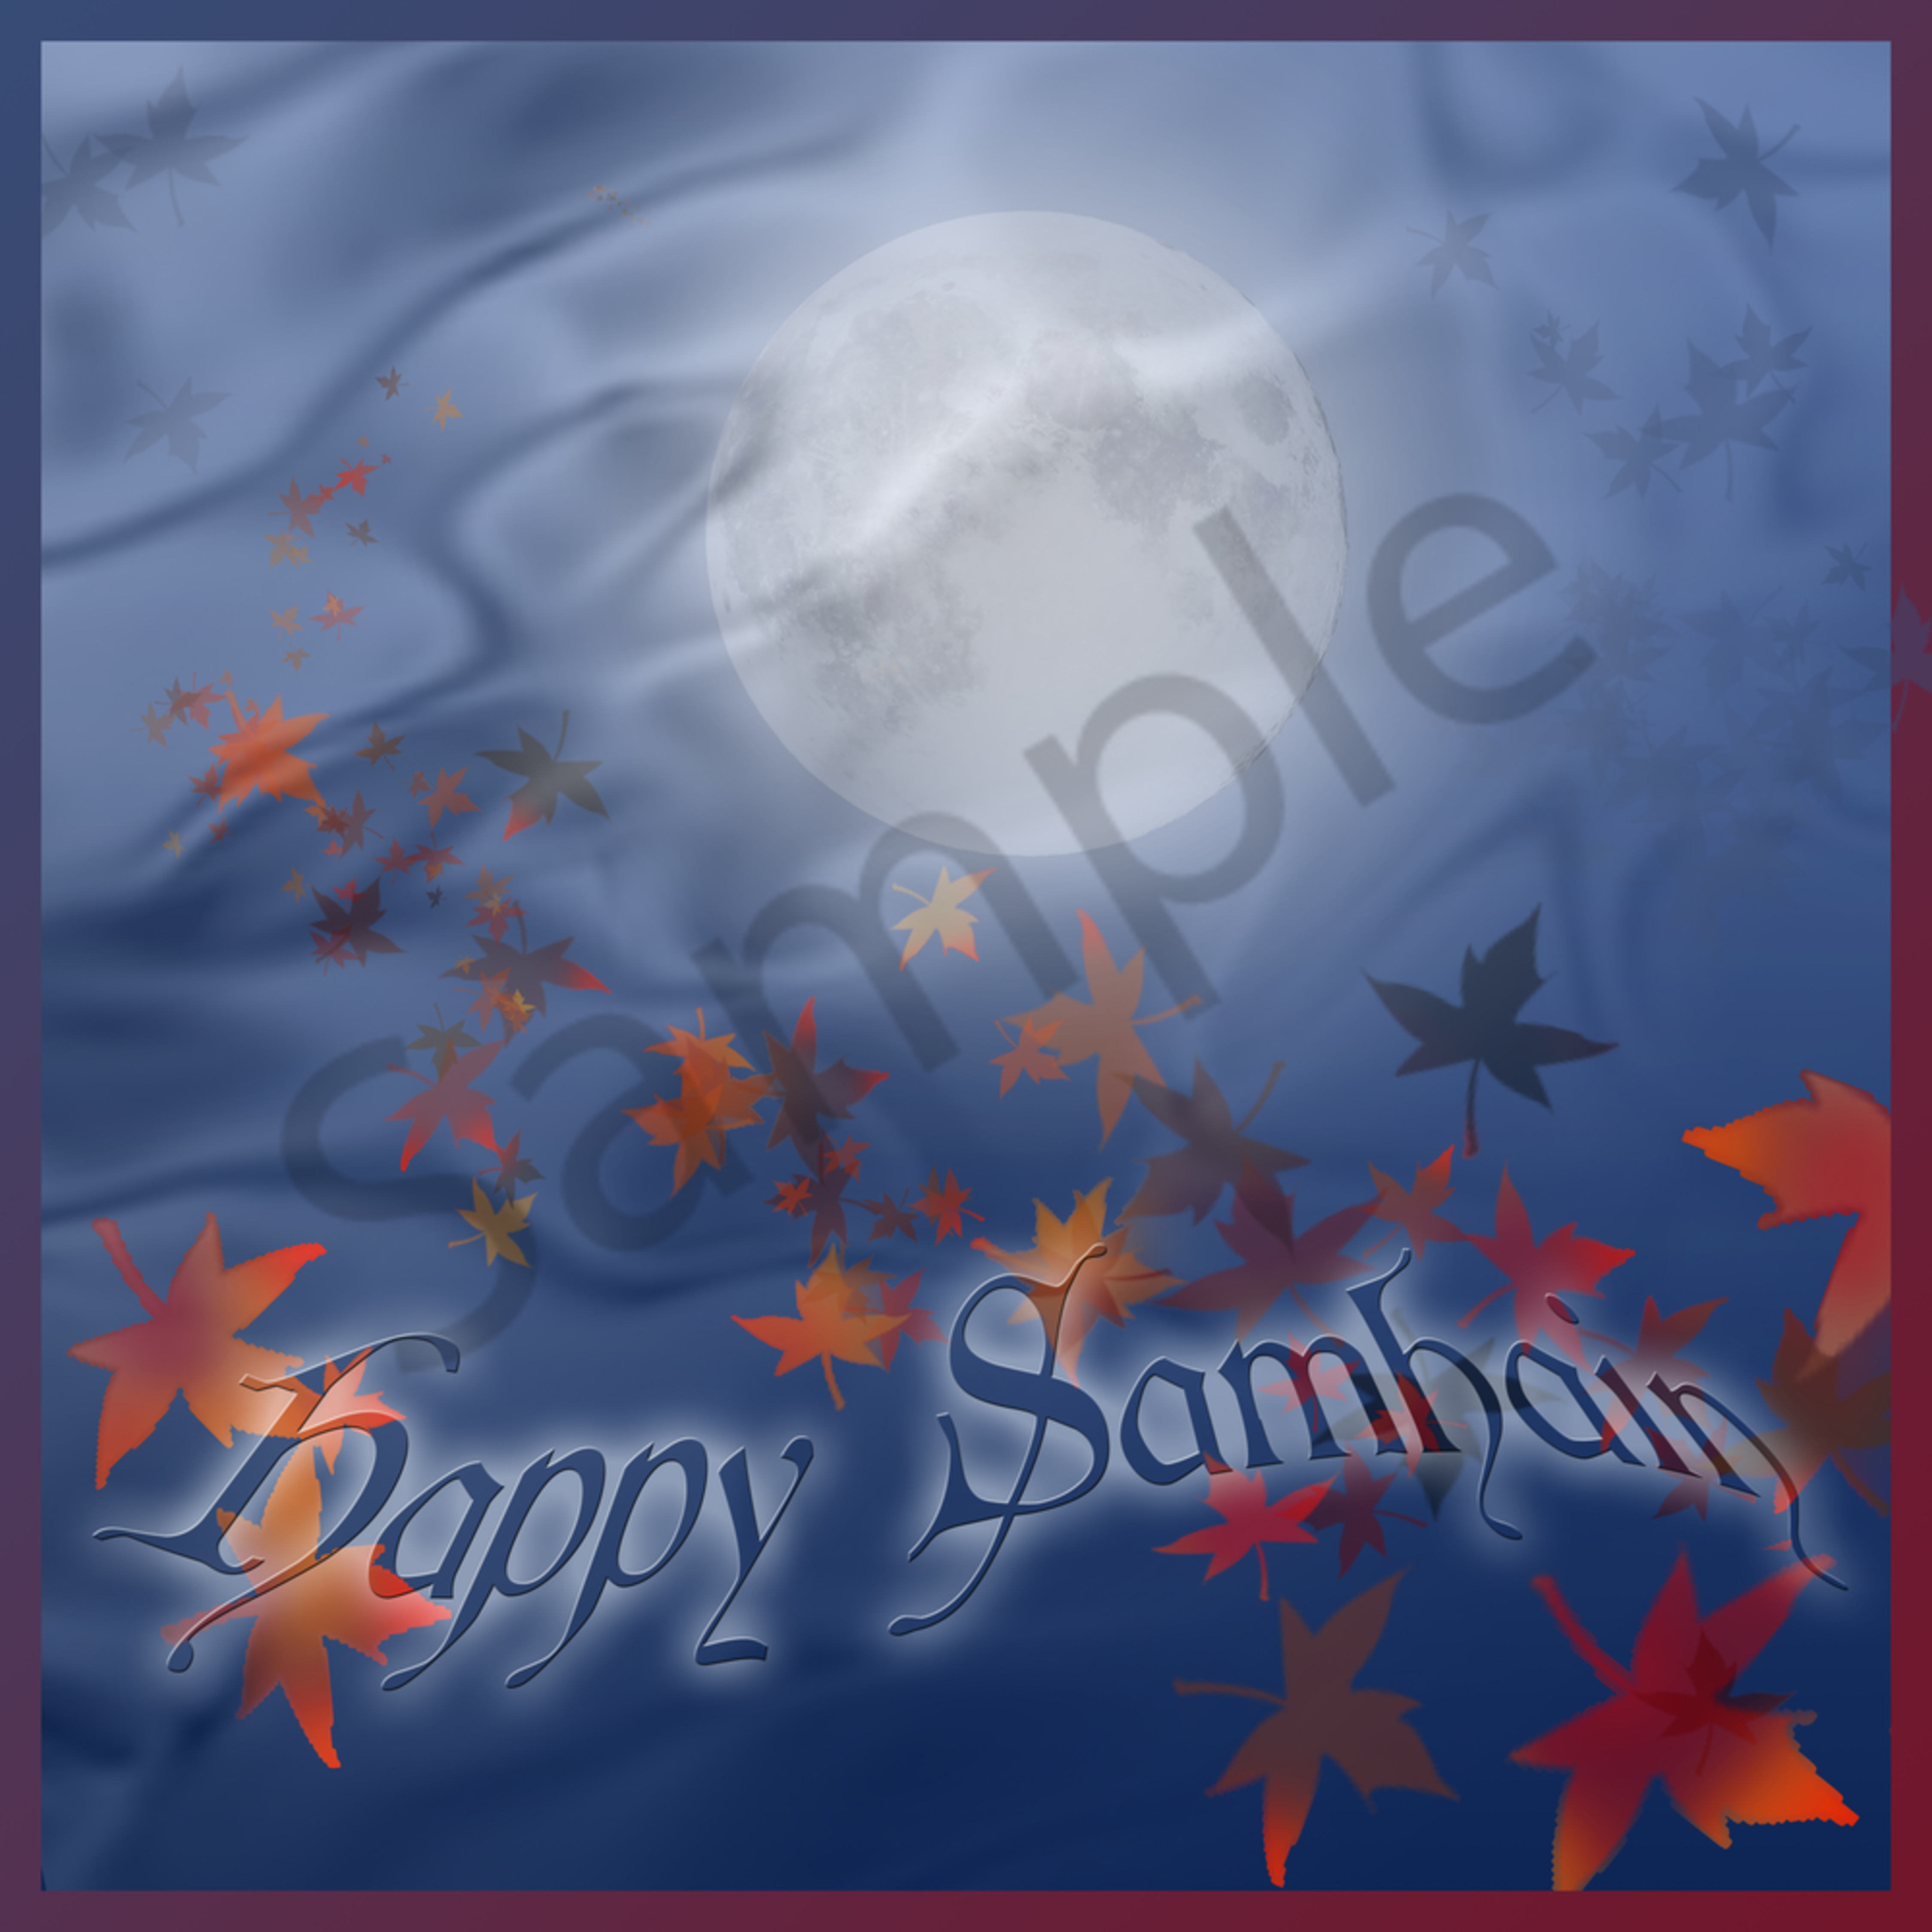 Samhain tdplib